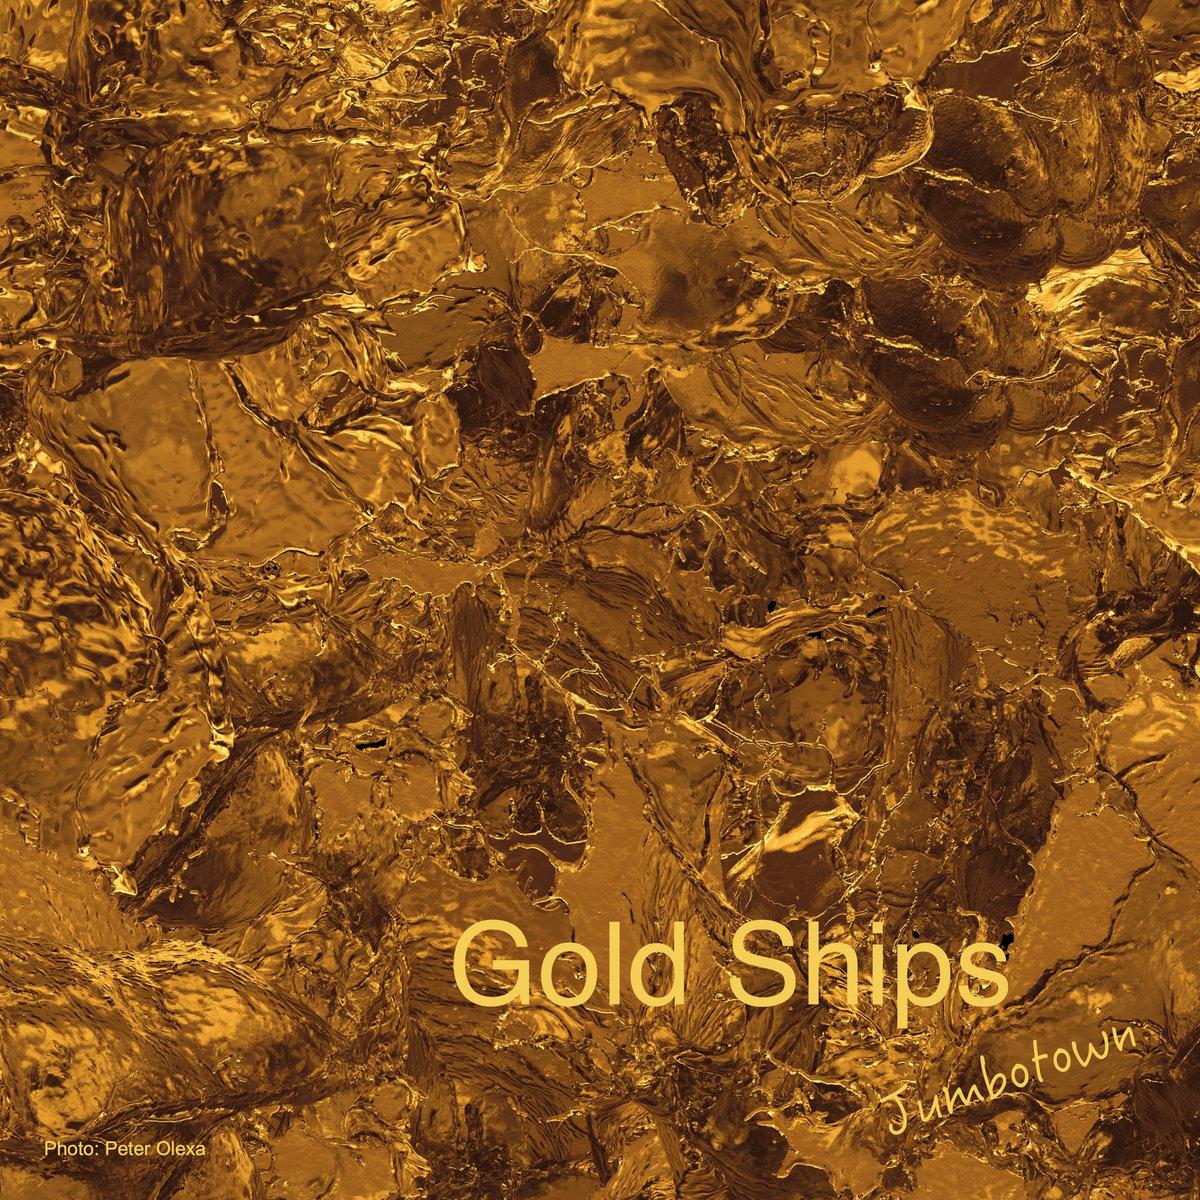 Gold Ships by Jumbotown